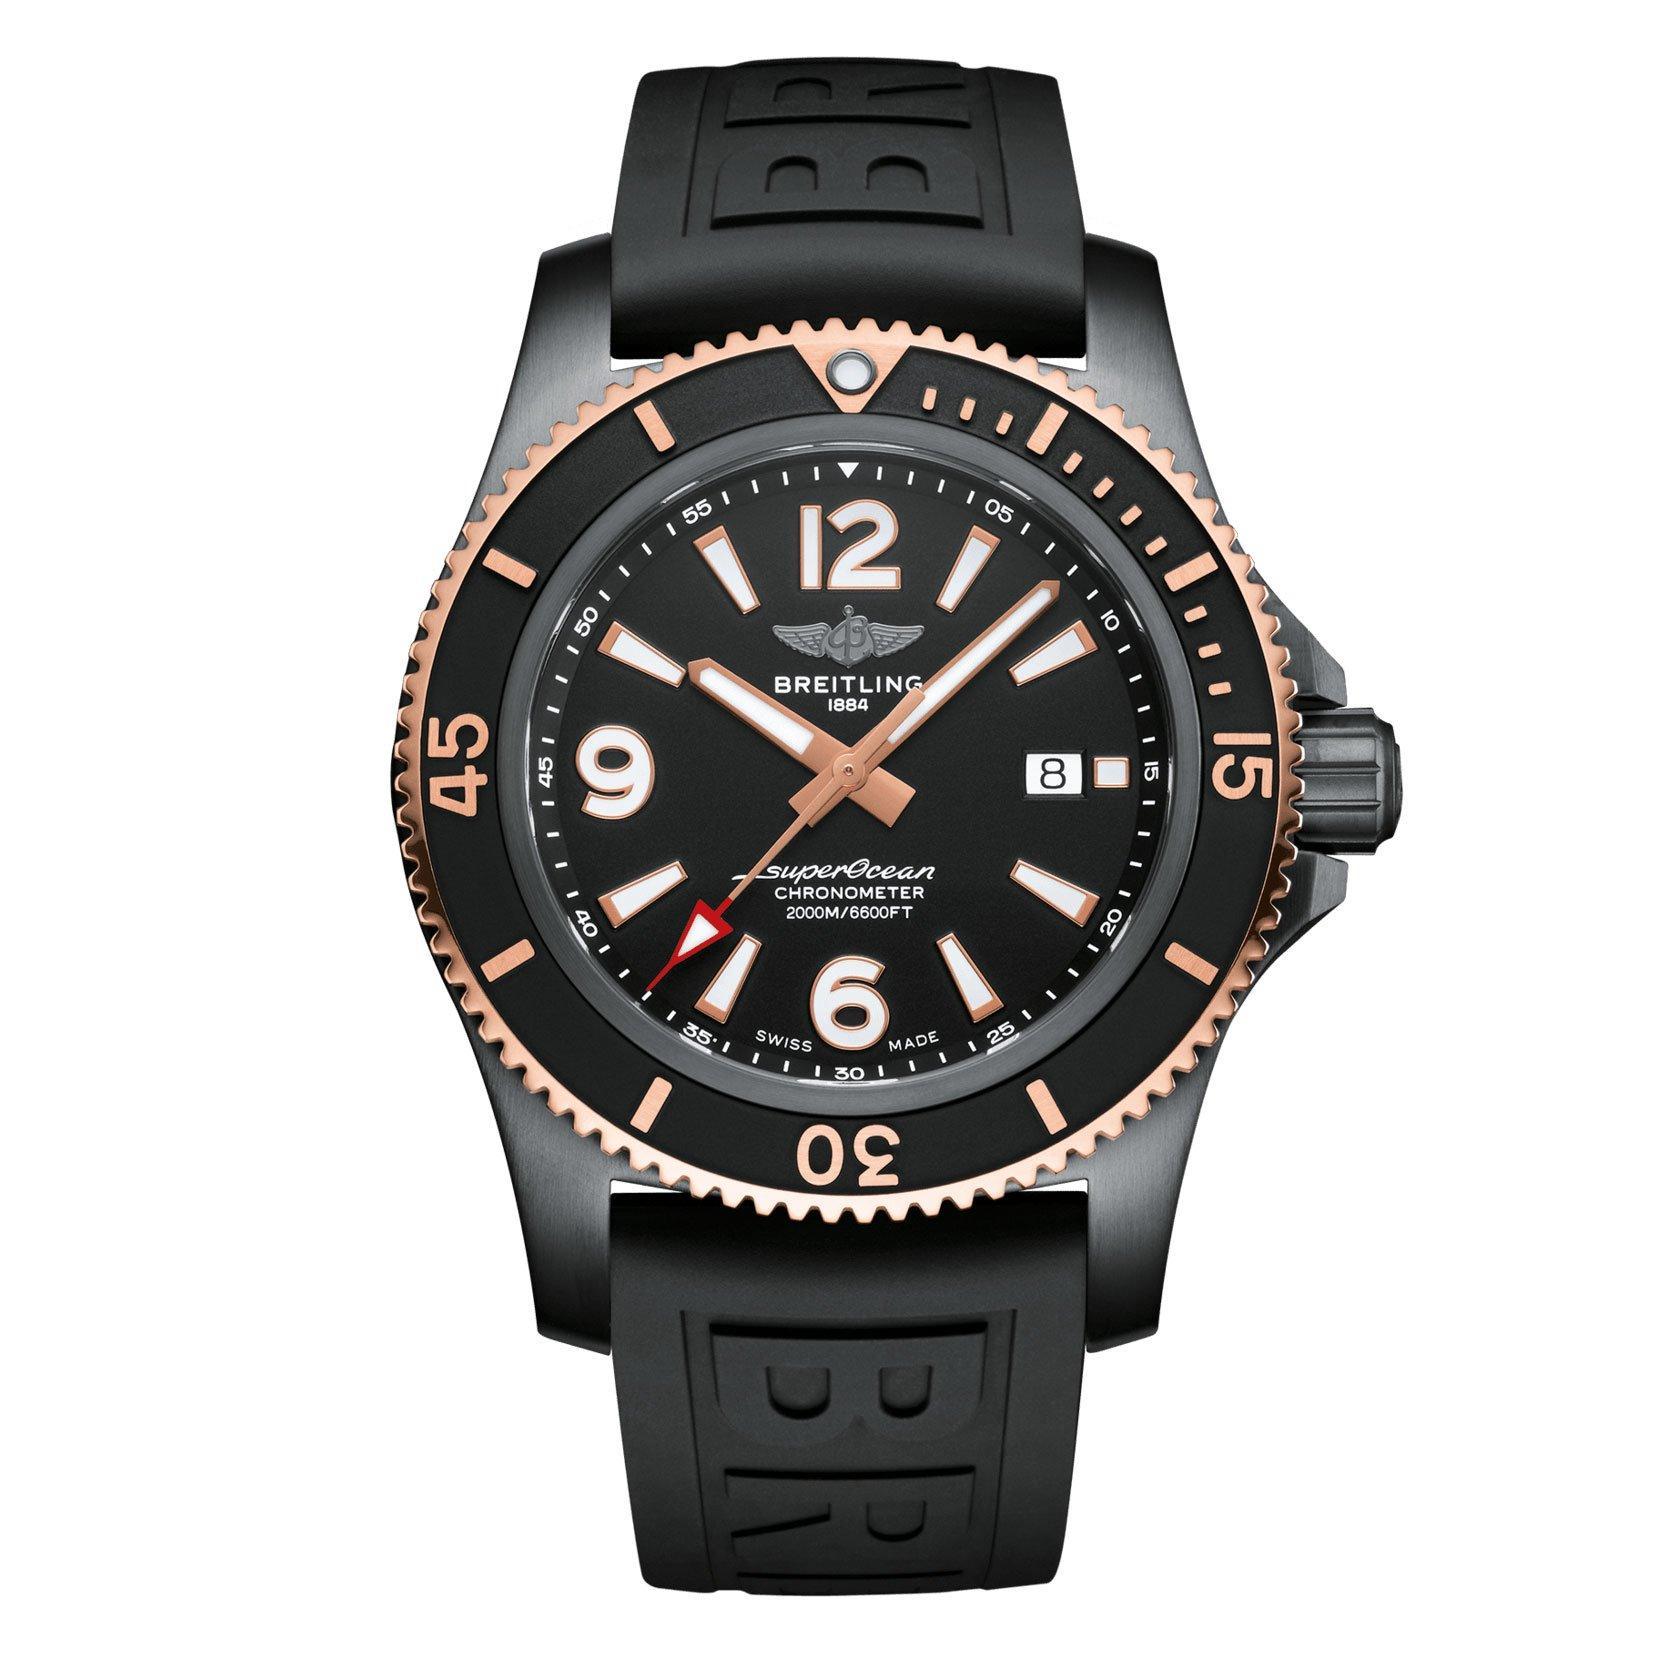 Breitling Superocean Automatic 46 Black Steel Men's Watch